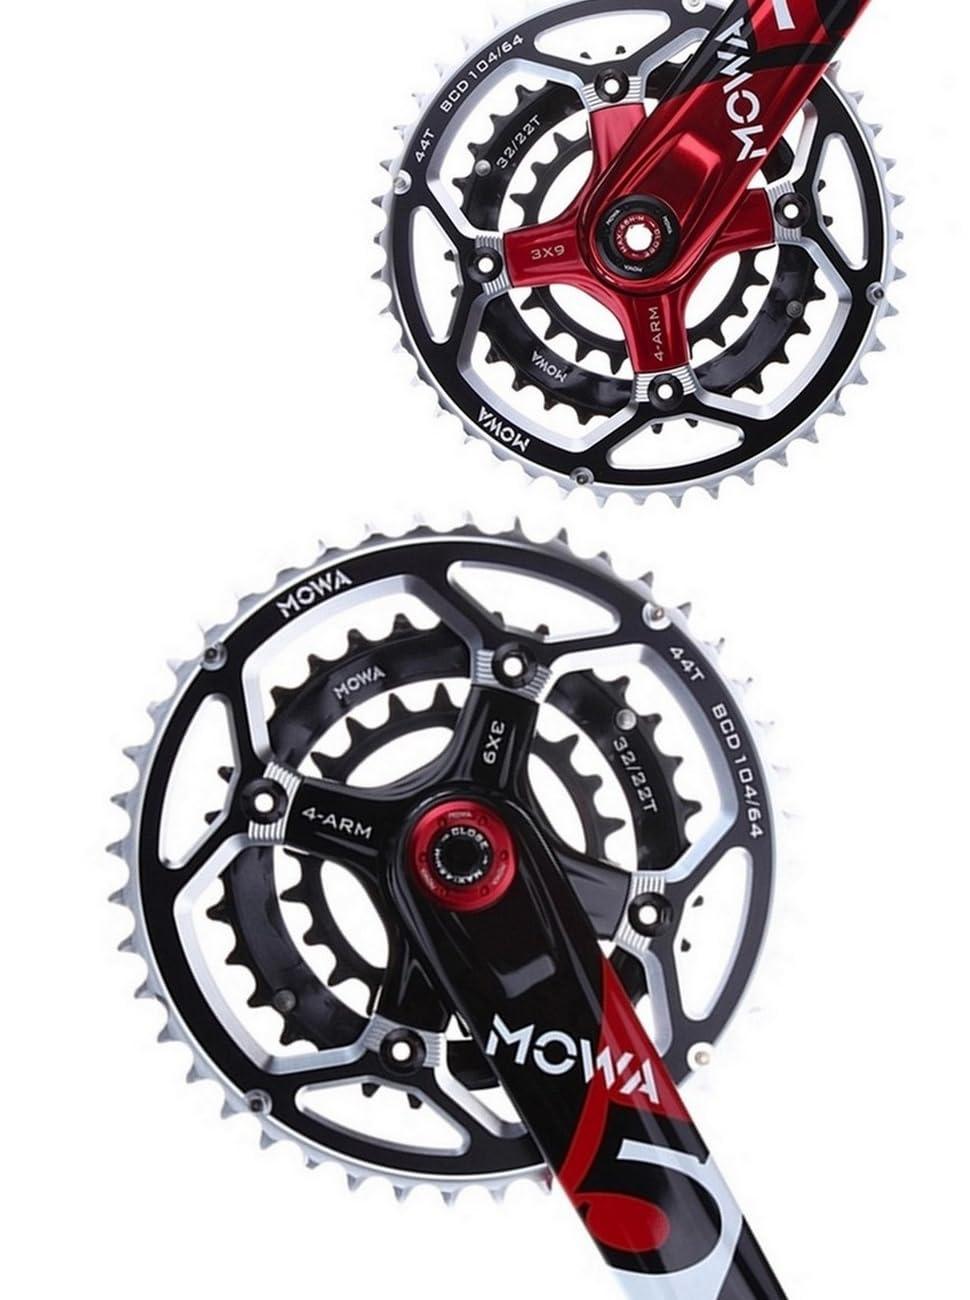 MOWA Five MTB Bicycle Bike 9 10 11 Speed Crank Arm for Shimano//Sram 175mm Red